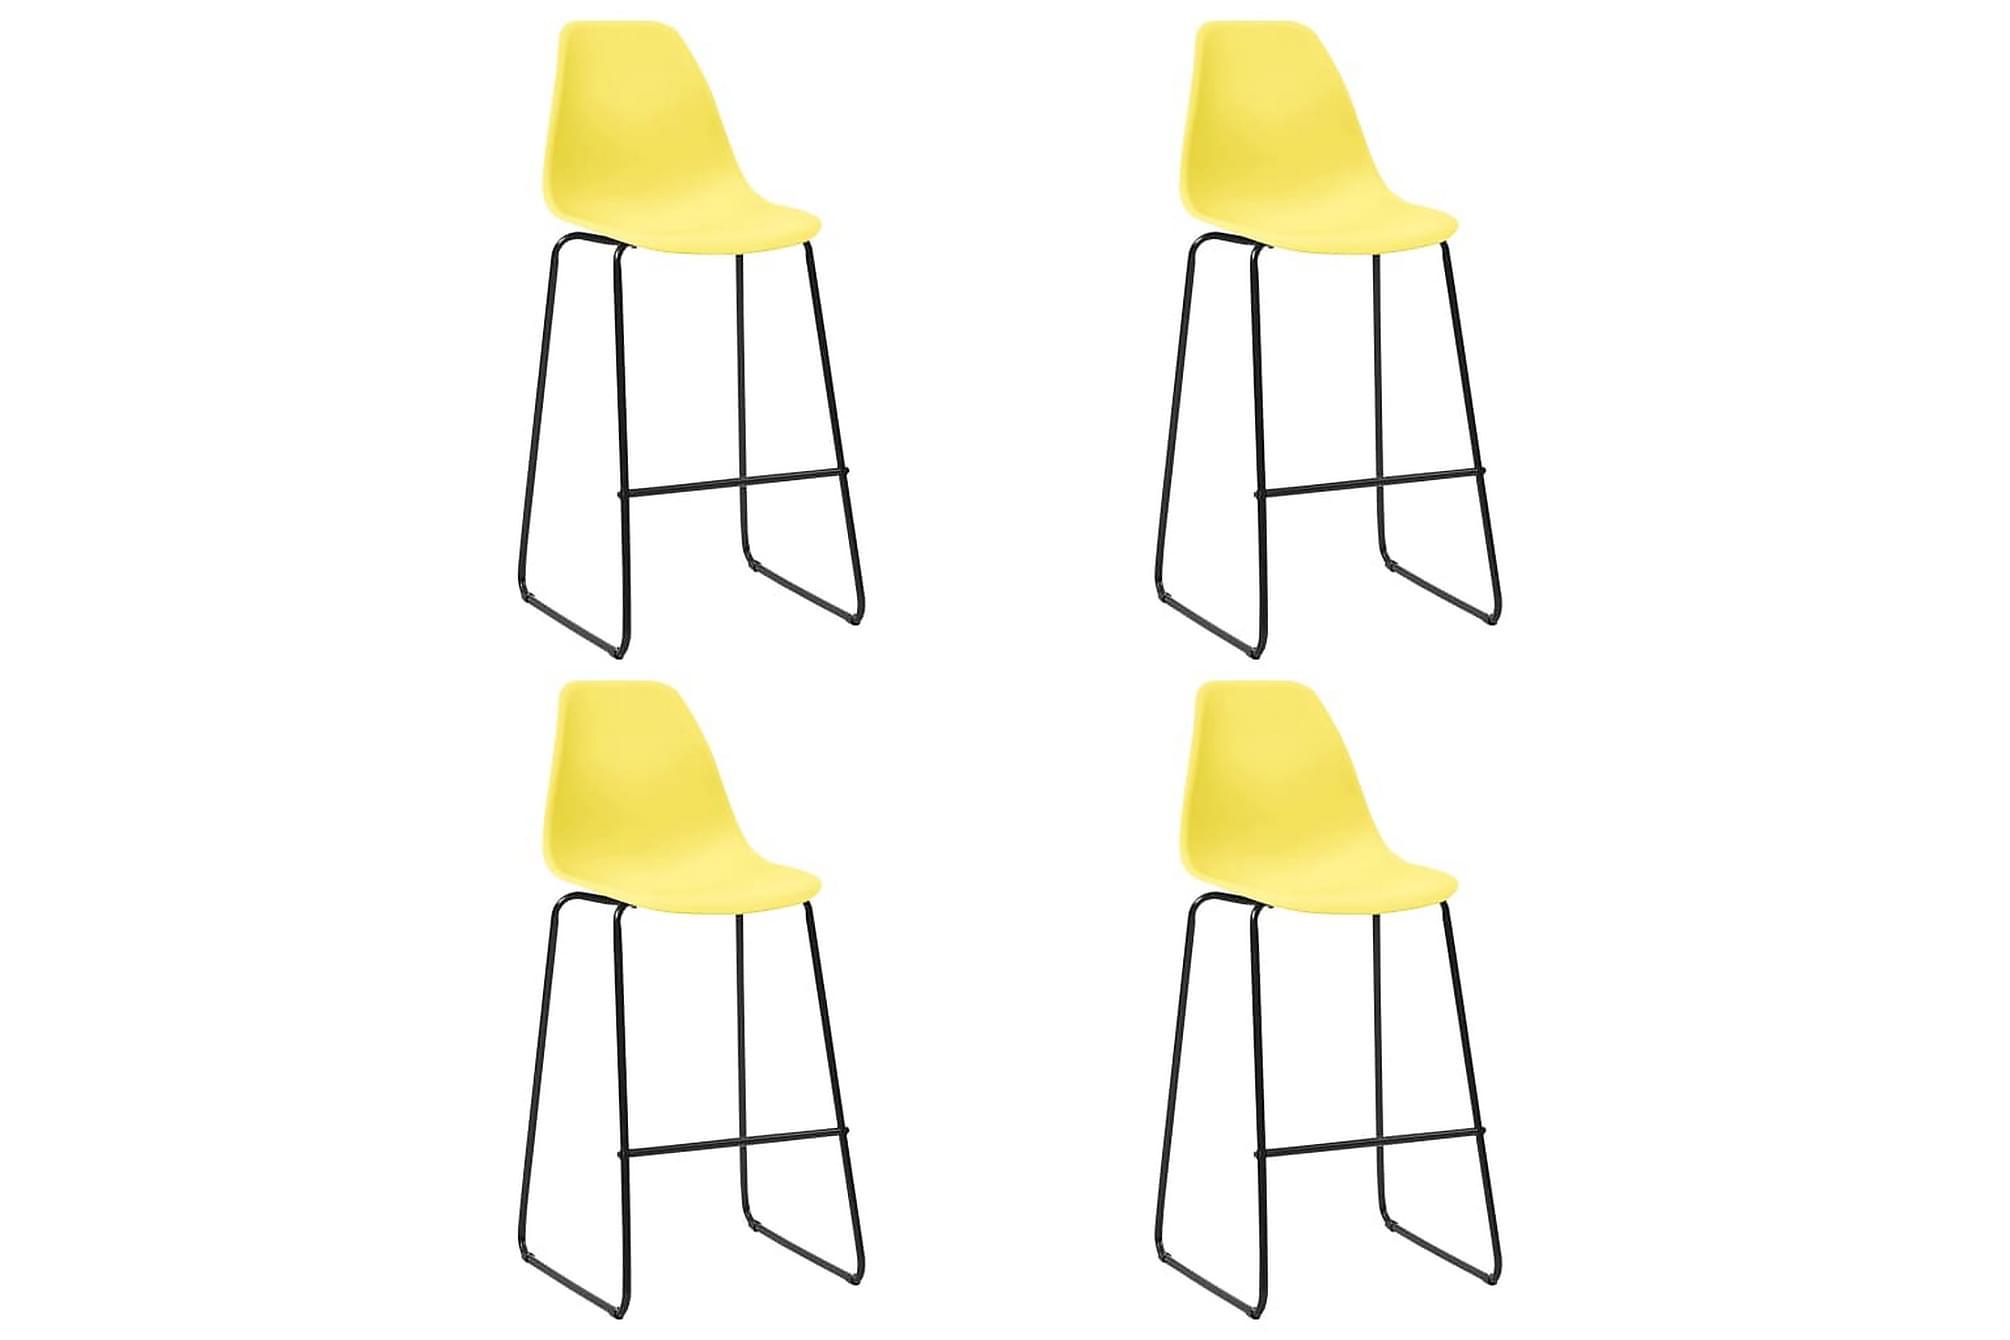 Barstolar 4 st gul plast